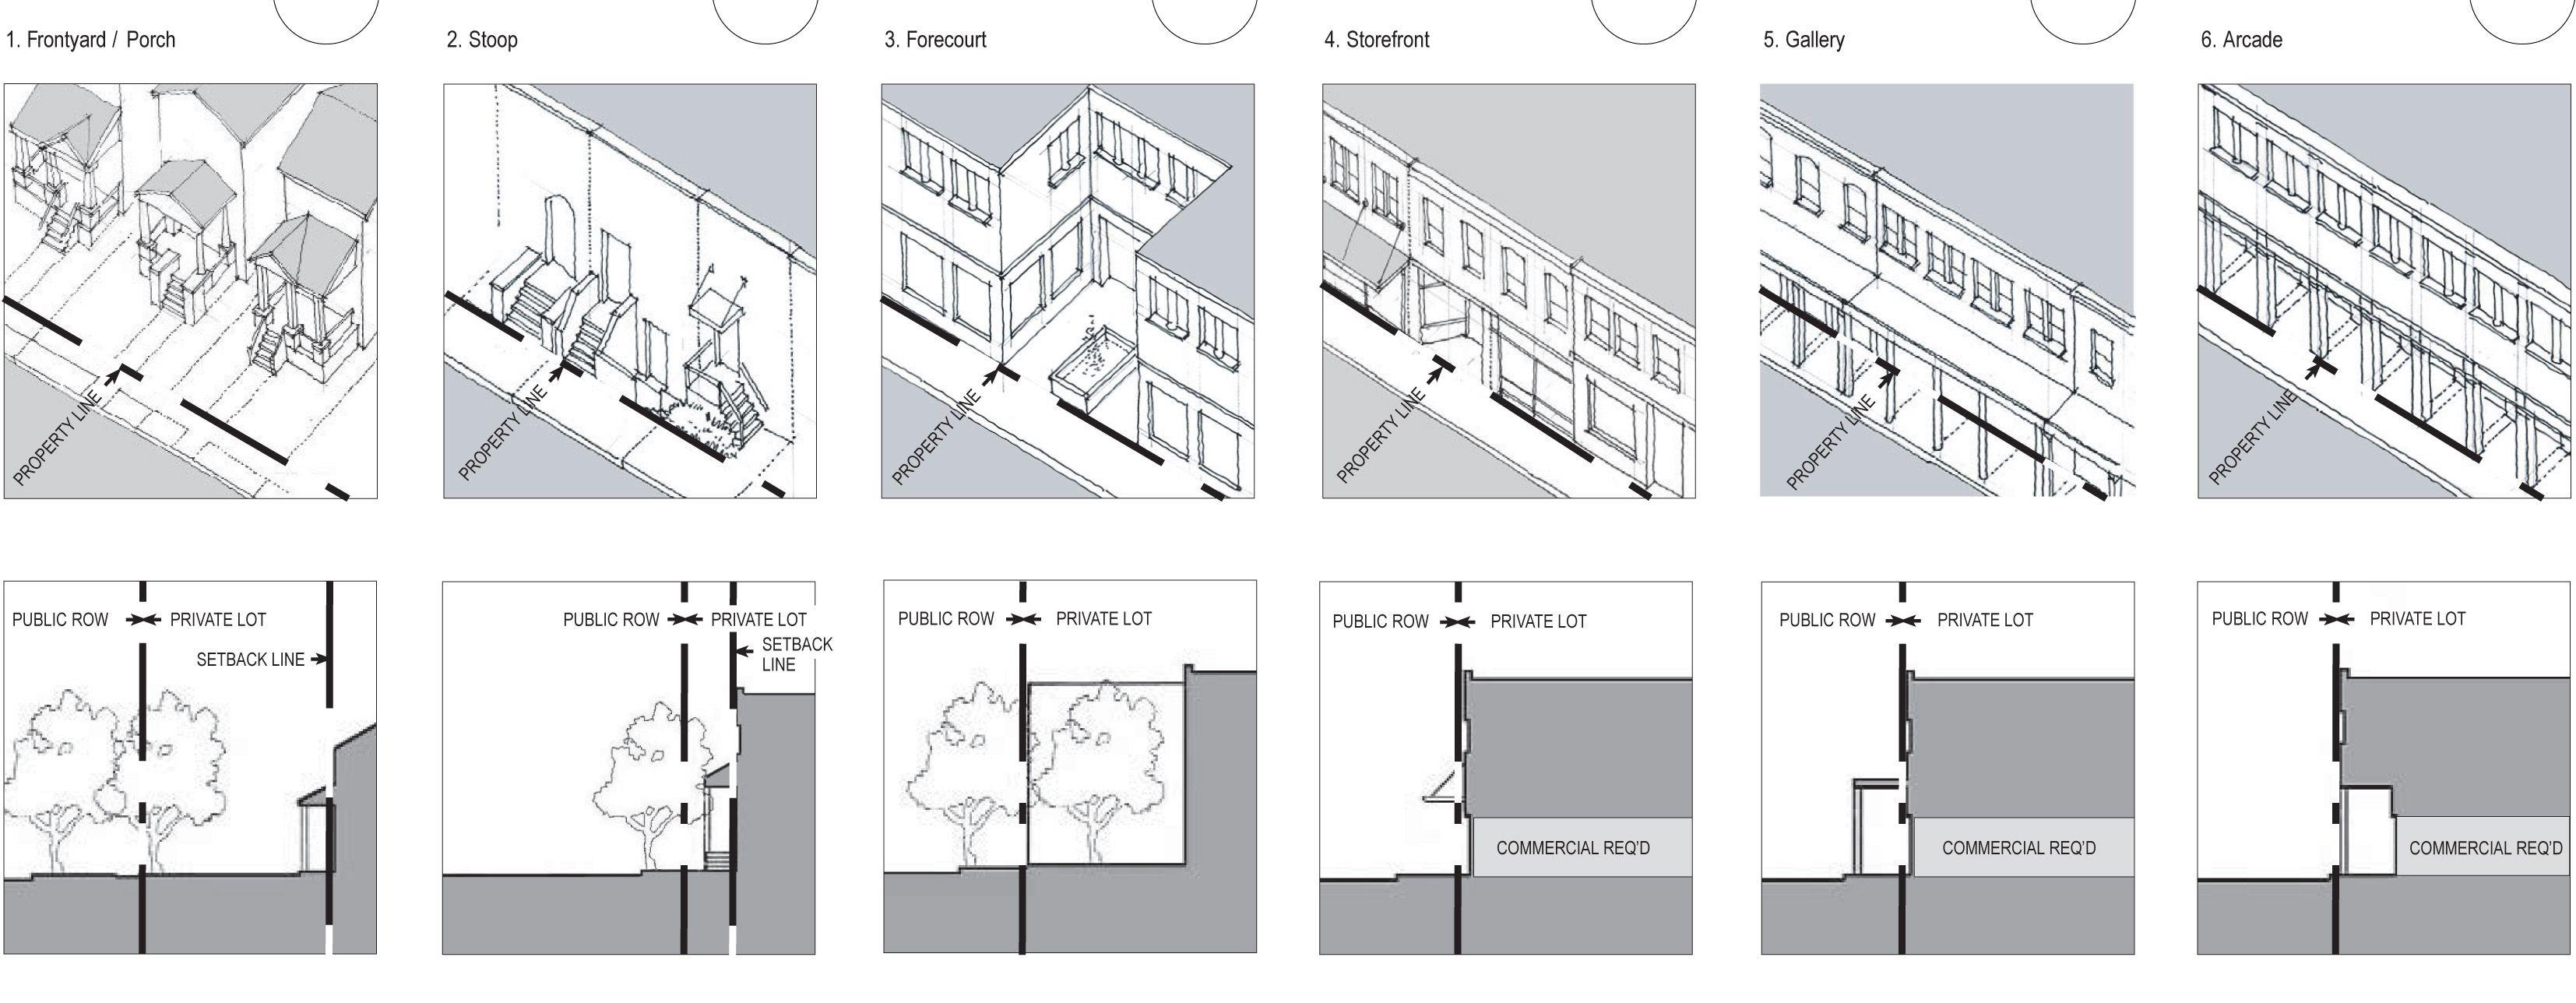 form-based code - Поиск в Google   analiz   Pinterest   Urban design